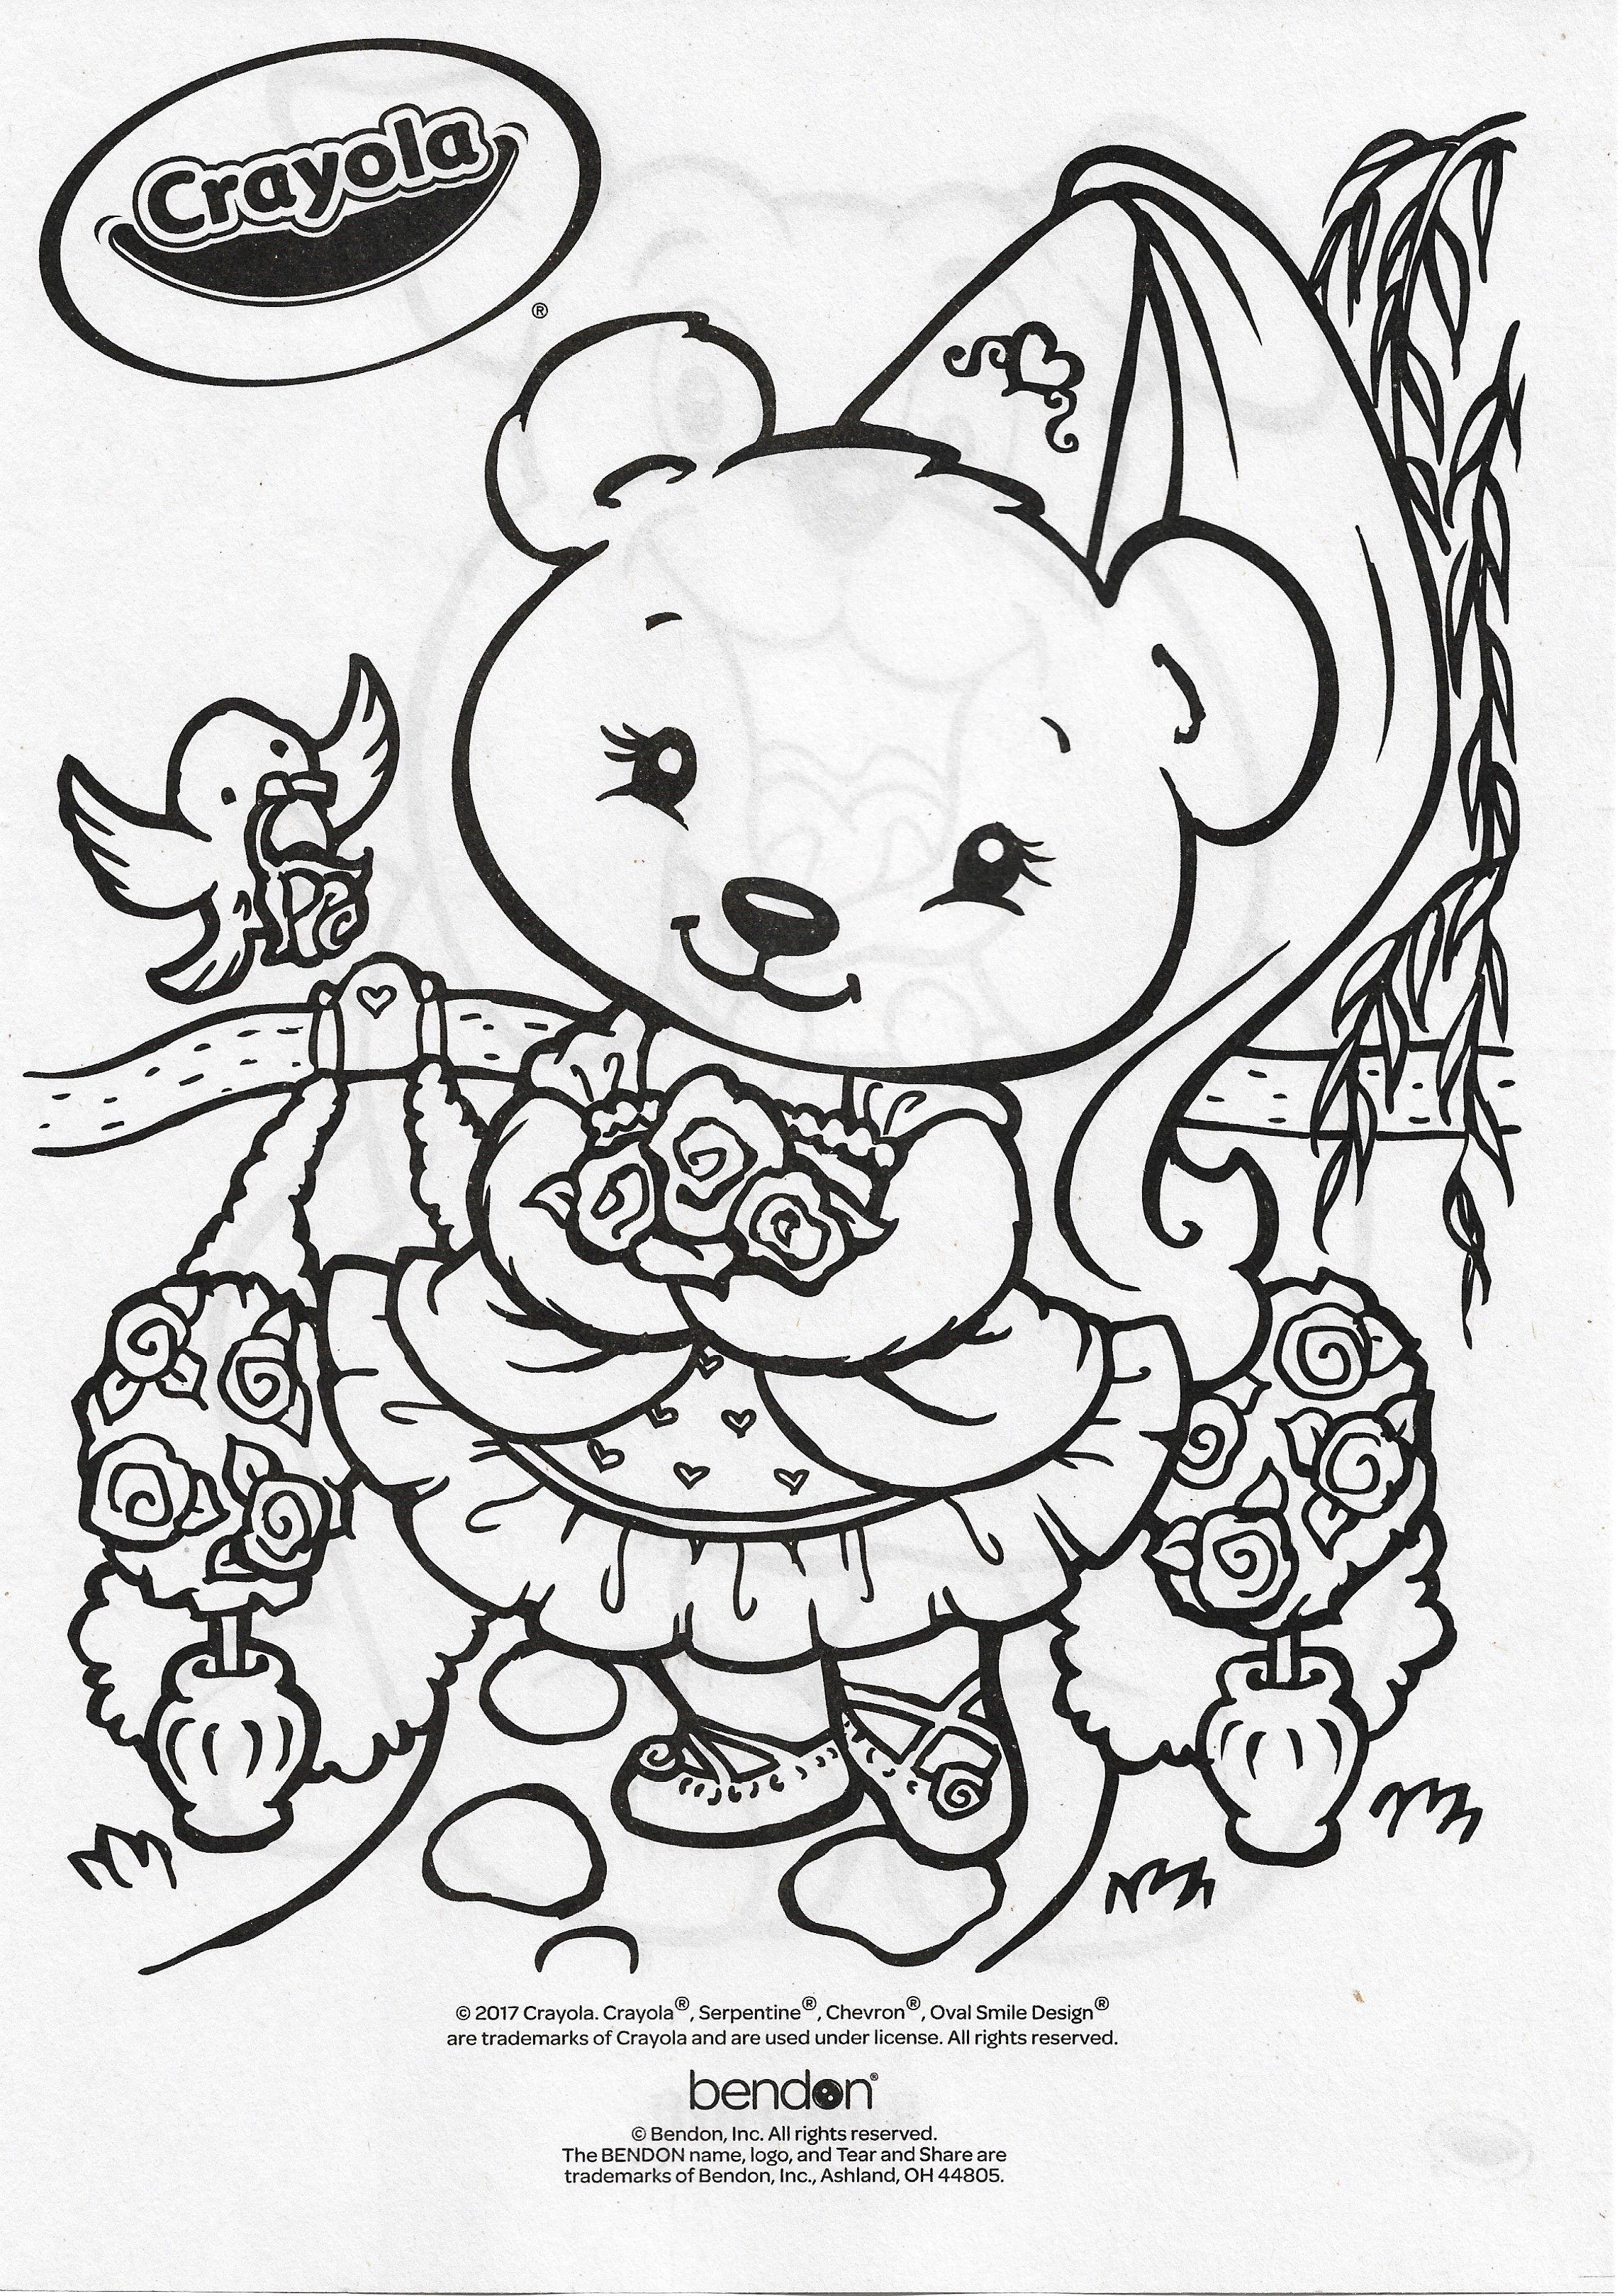 2020 Crayola Serpentine Design Christmas Colored Crayola Coloring Pages in 2020 | Crayola coloring pages, Bear